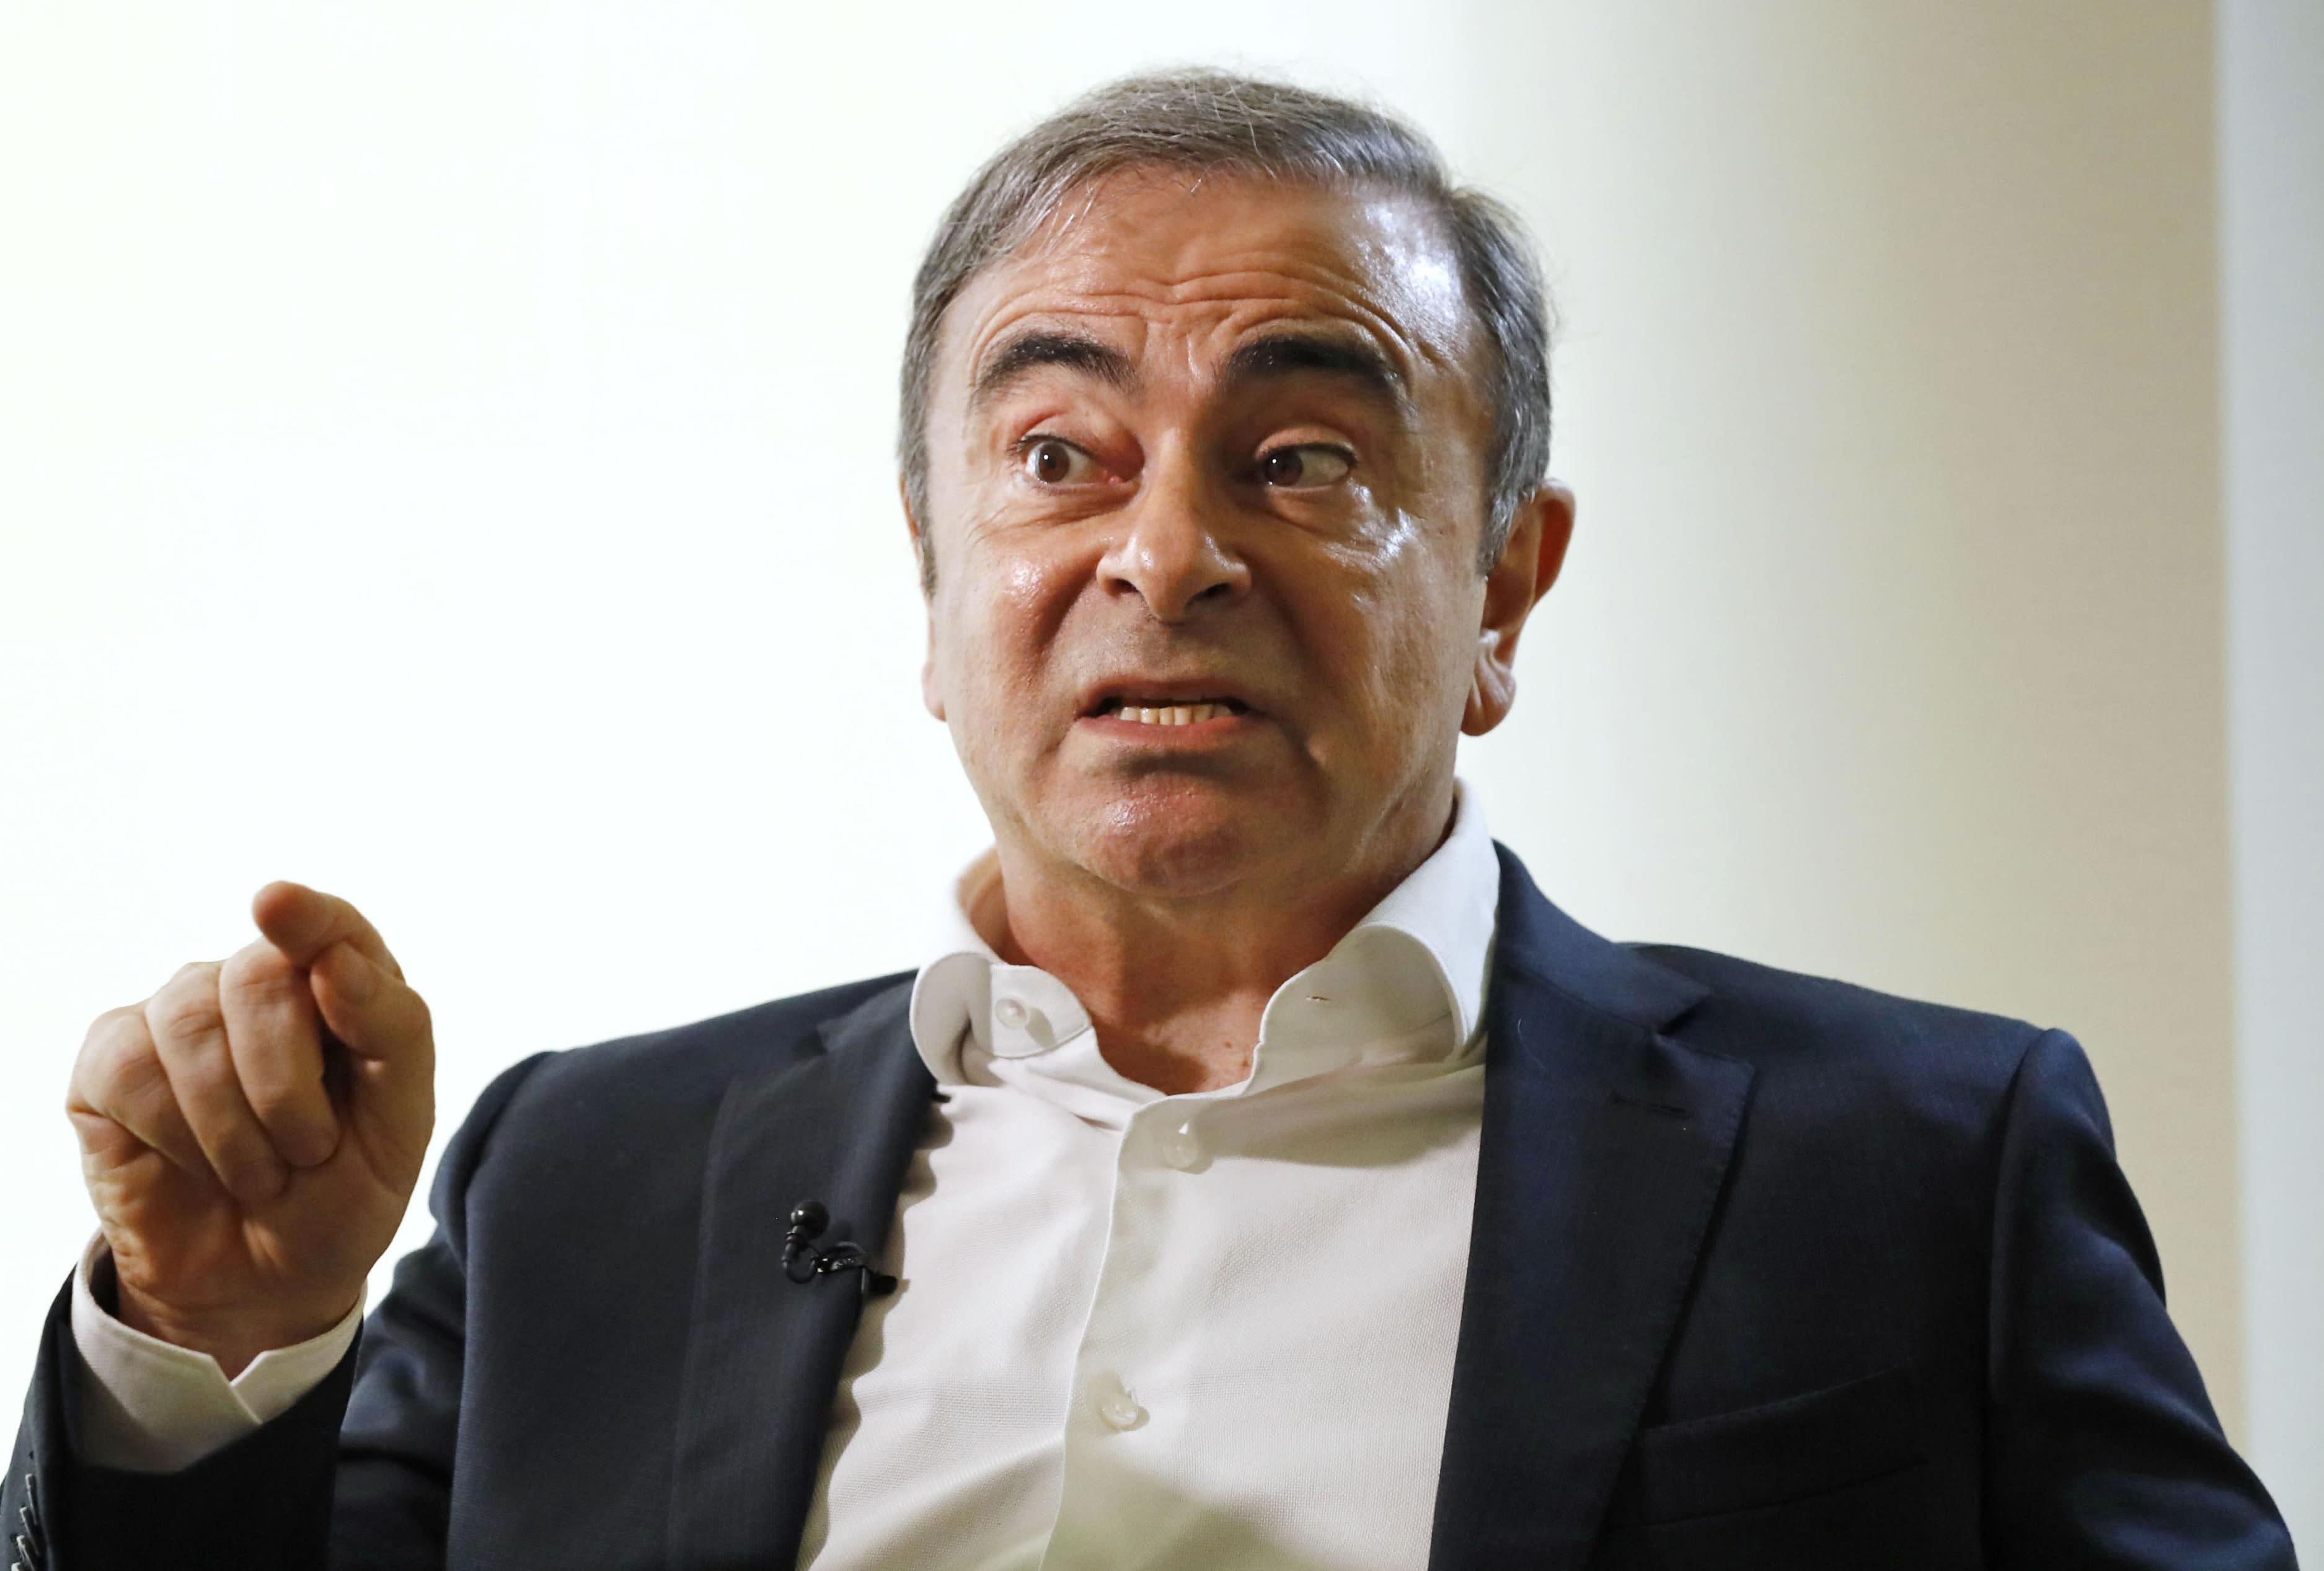 Lebanon Carlos Ghosn